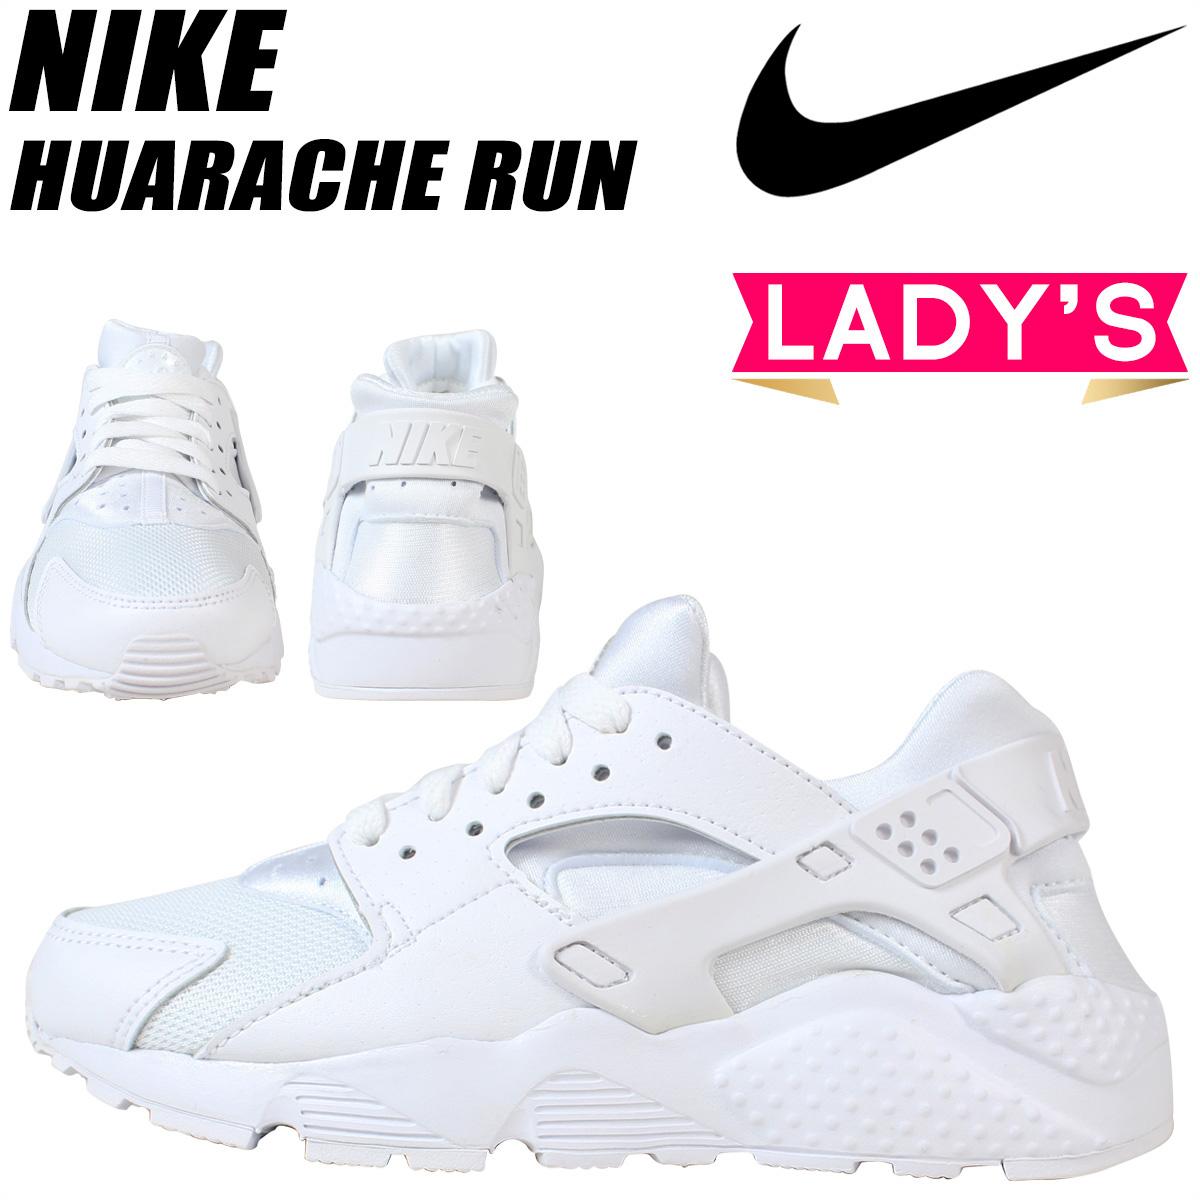 NIKE ナイキ ハラチラン スニーカー レディース HUARACHE RUN GS 654275-110 靴 ホワイト